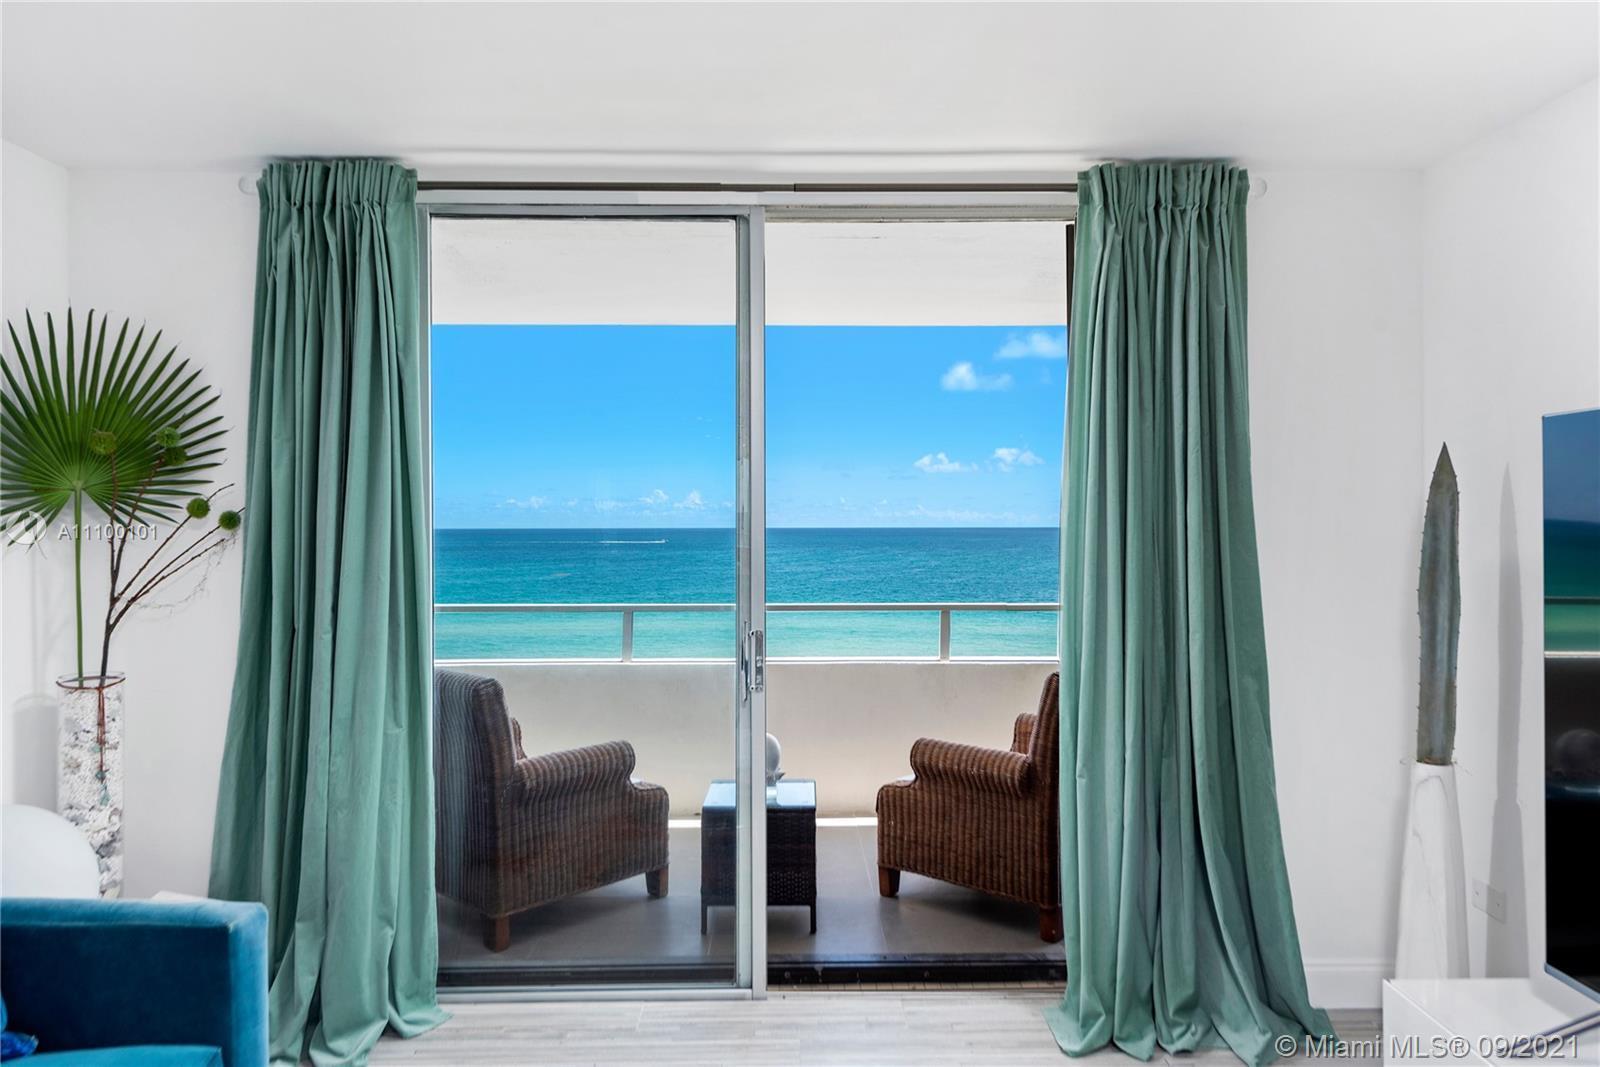 Iconic Morris Lapidus bldg on Millionaire's Row in Miami Beach-Completely renovated 2/2 residence w/